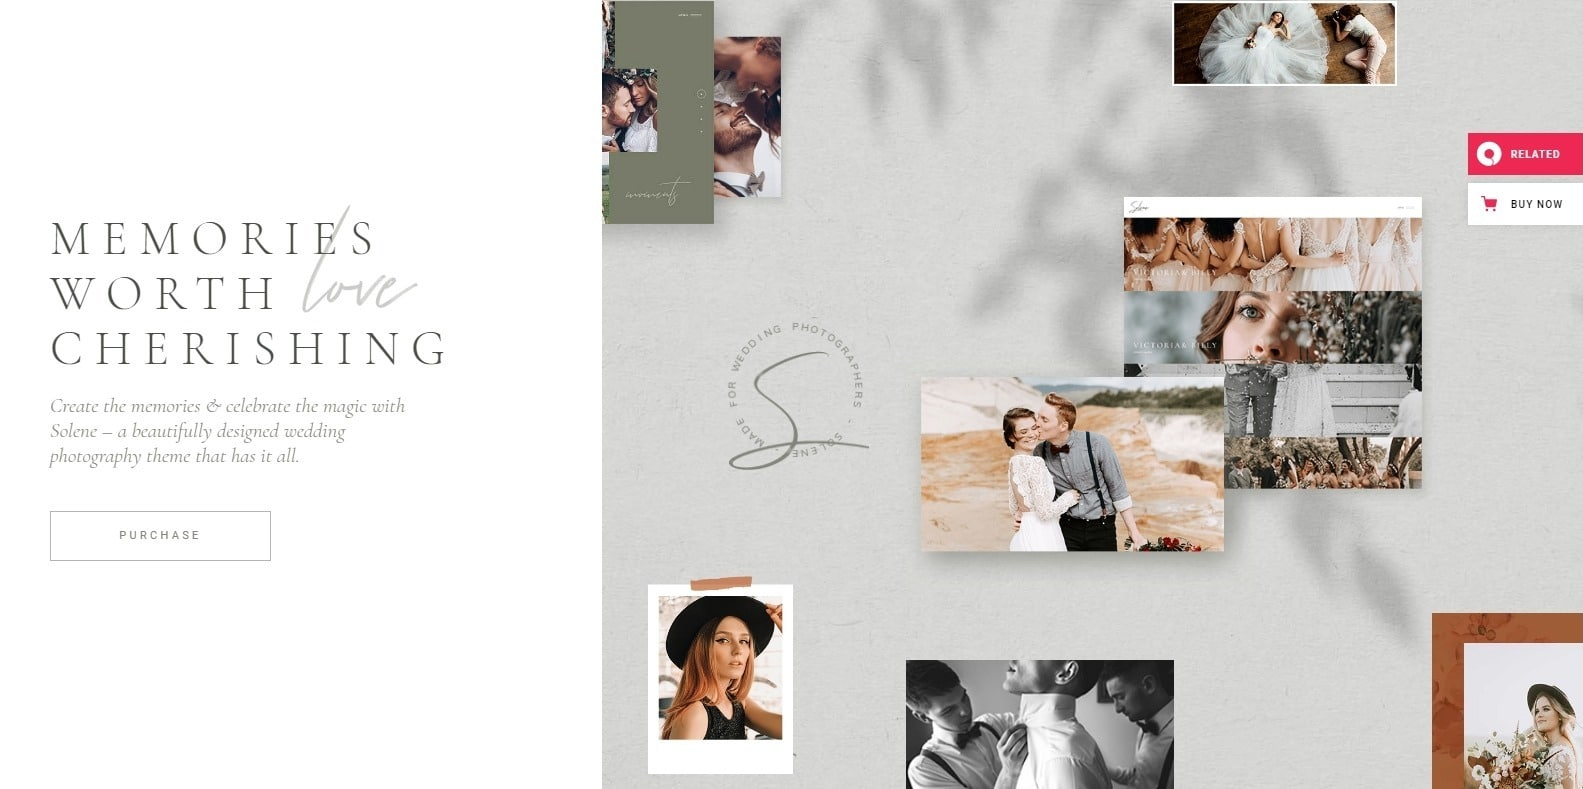 solene-photo-gallery-templates